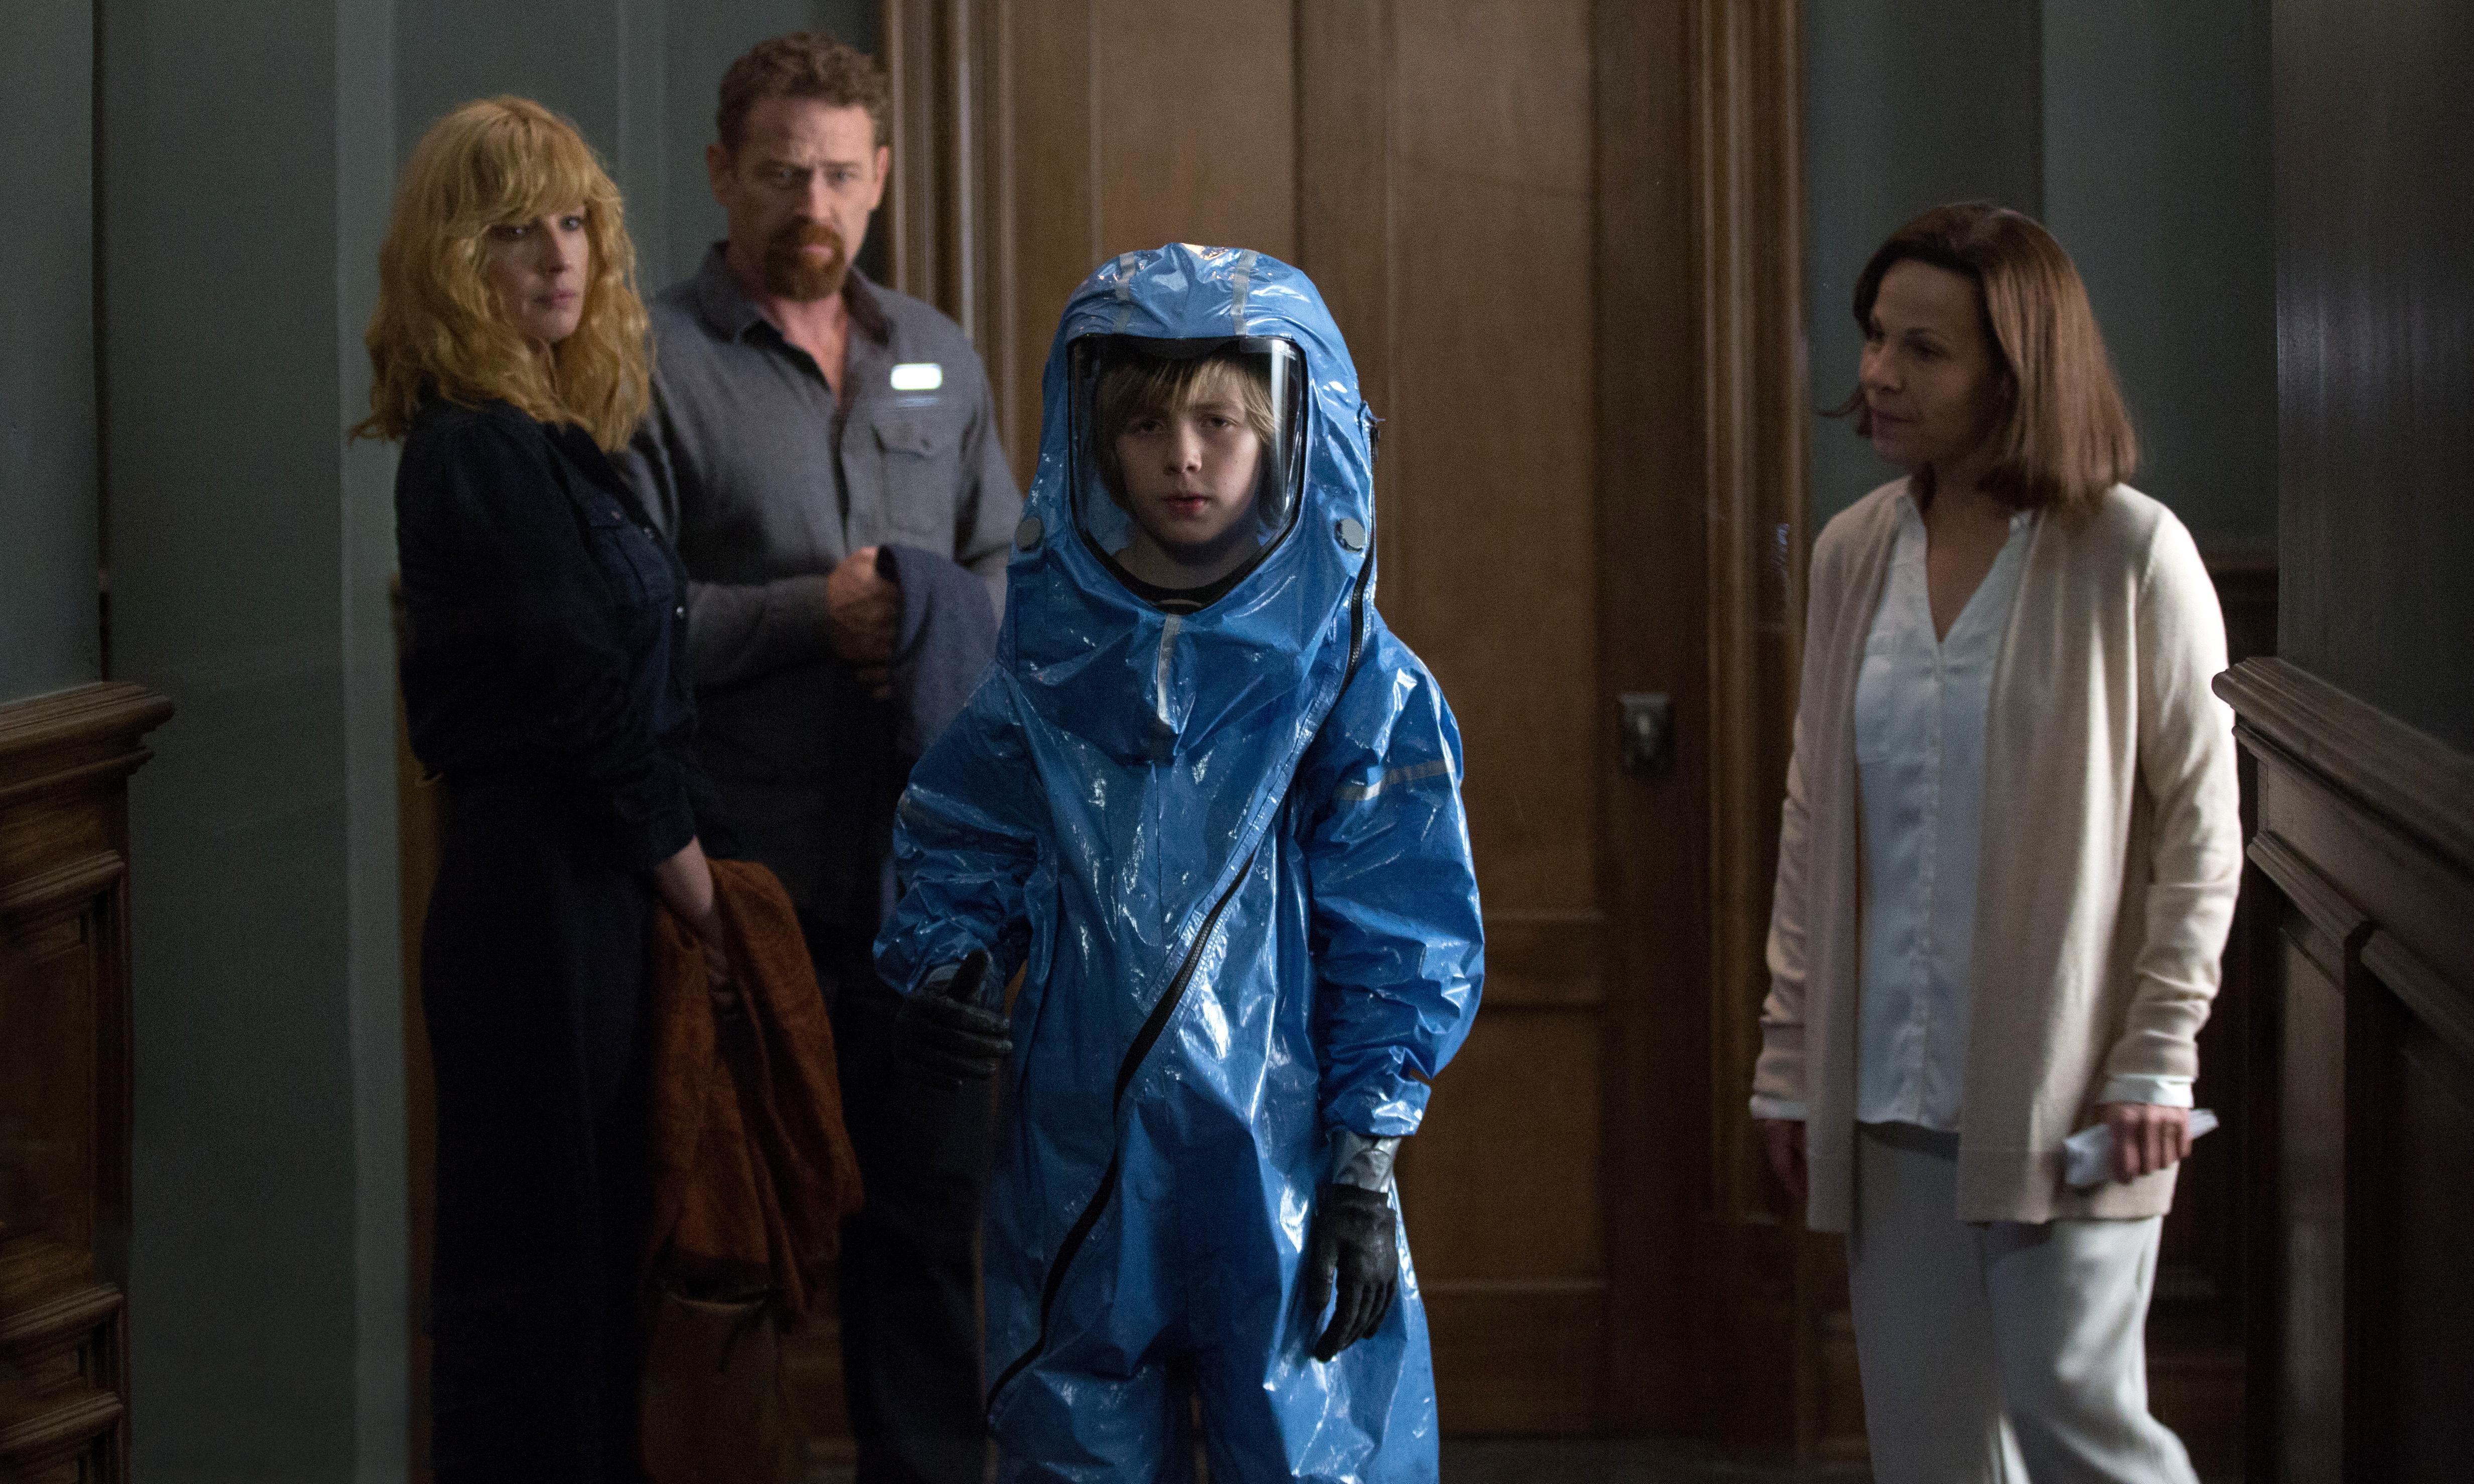 Eli review – schlocky Netflix horror devolves into supernatural silliness